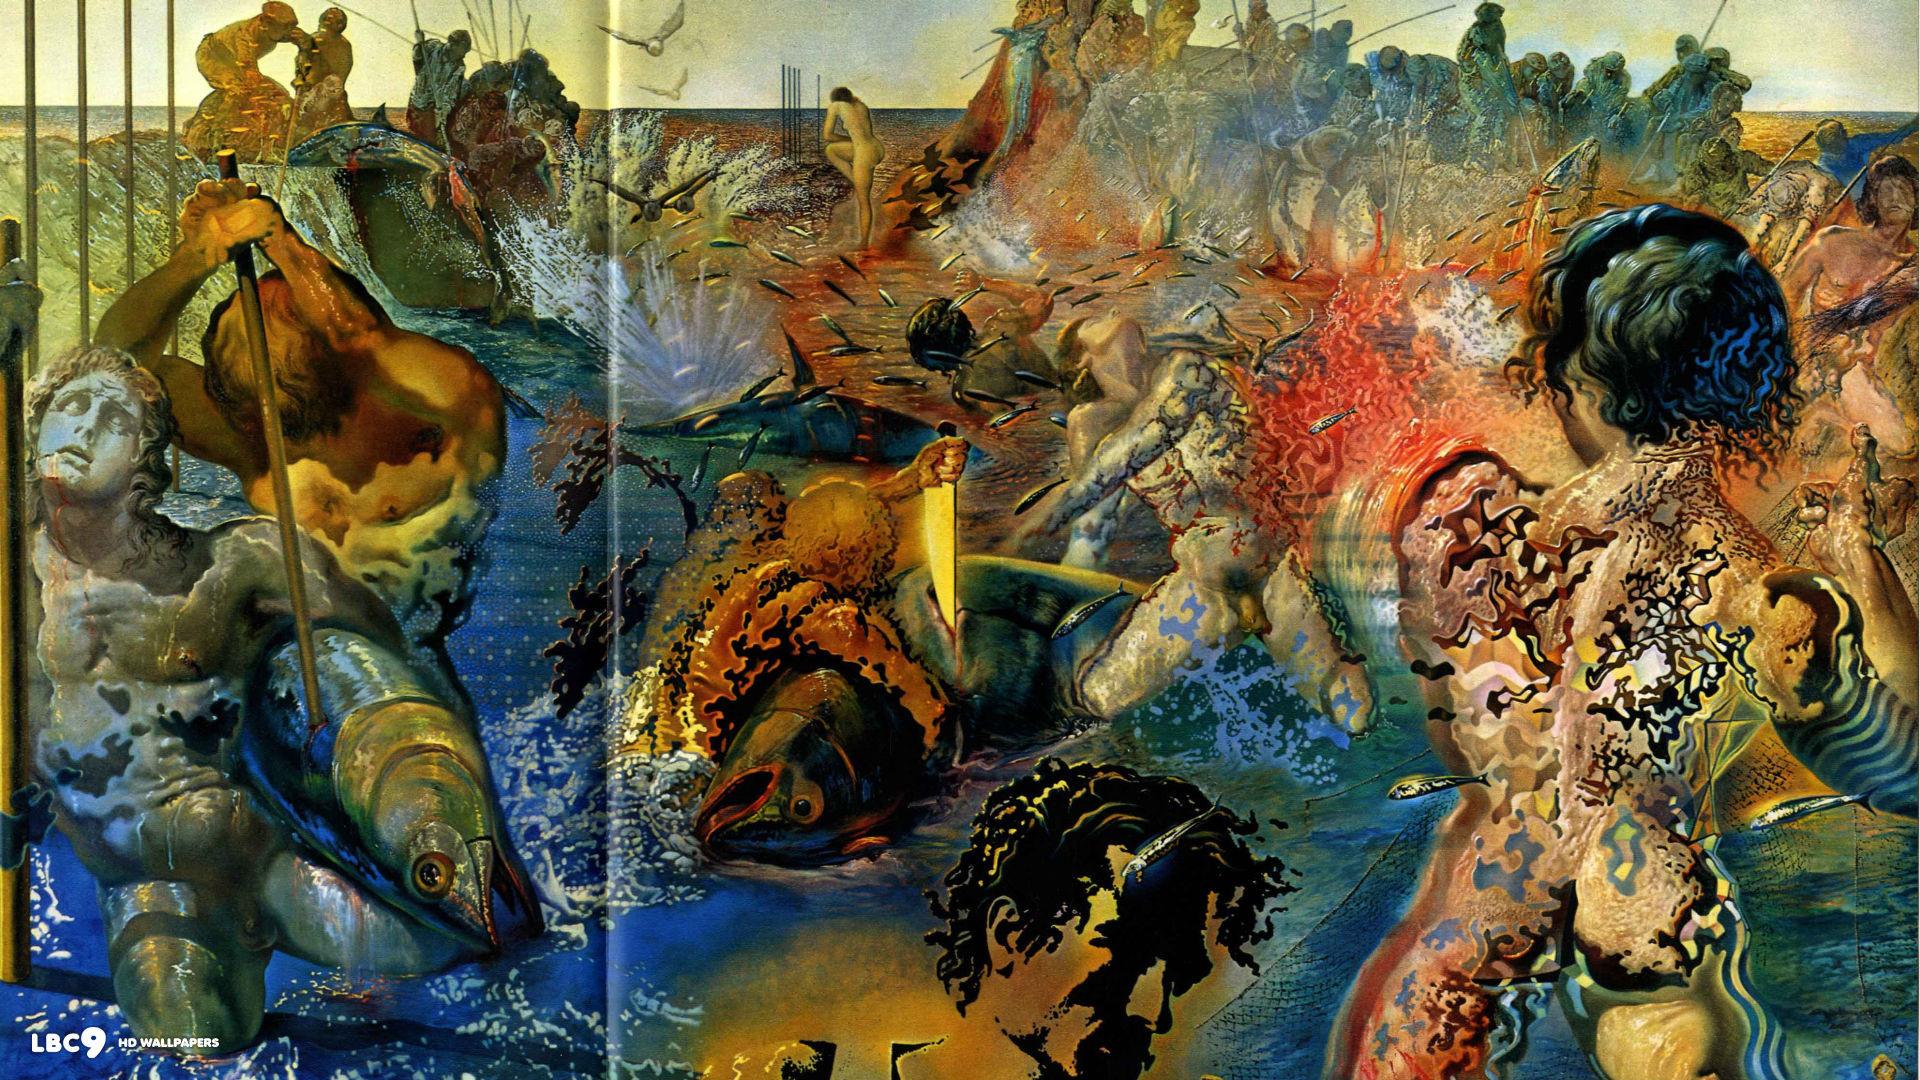 salvador dali wallpaper 37/38 | paintings hd backgrounds